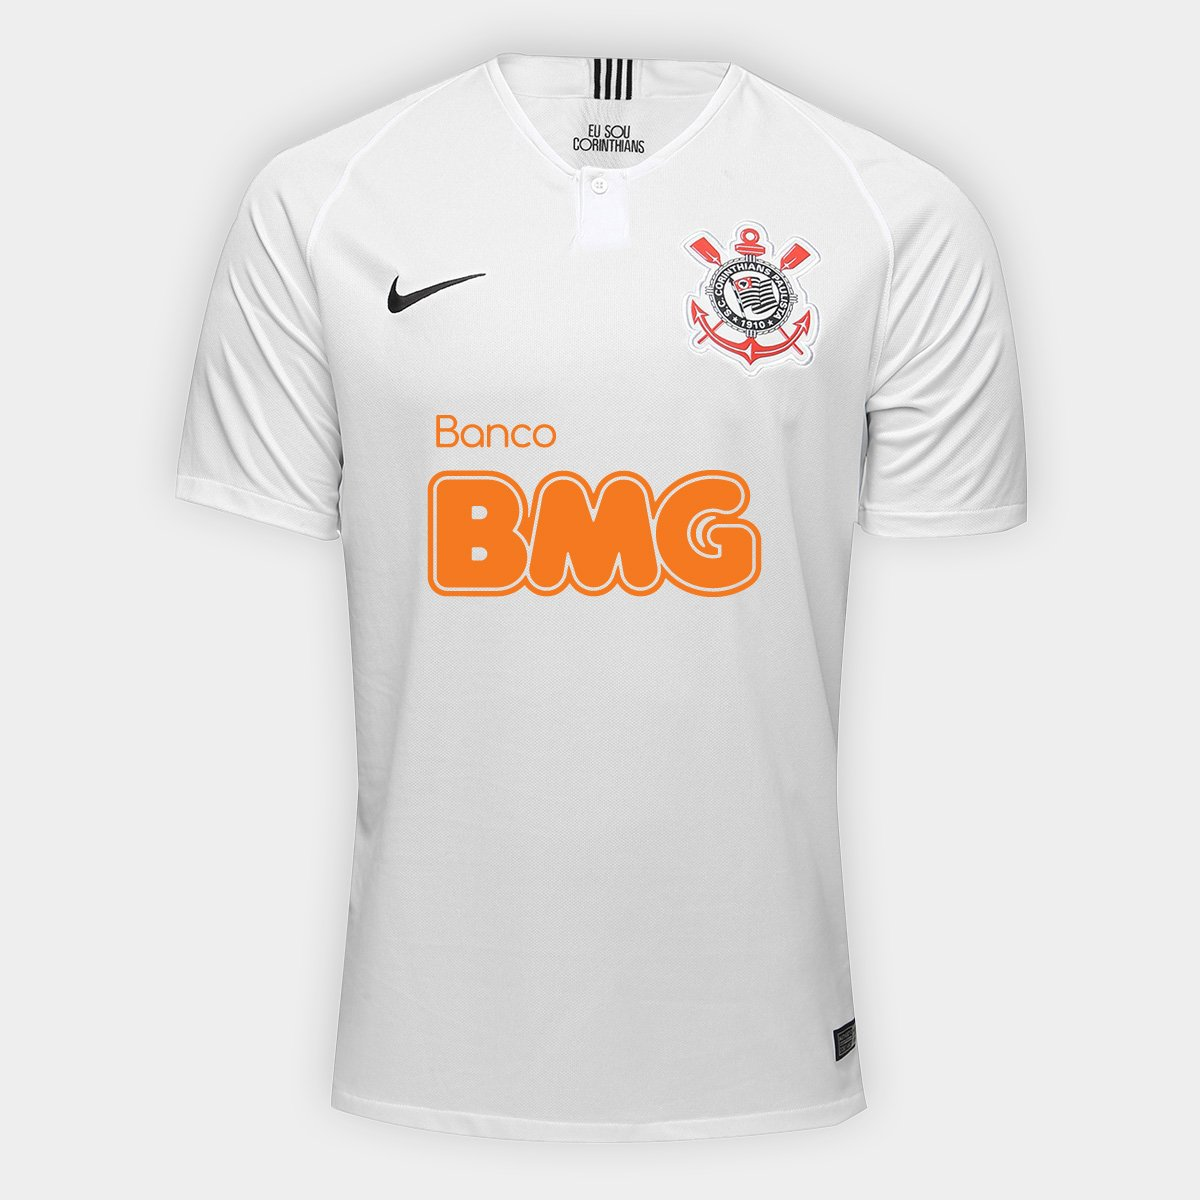 f0832889ae132 Camisa Corinthians I 18 19 s n° Patrocínio BMG Torcedor Nike Masculina -  Branco e Preto - Compre Agora